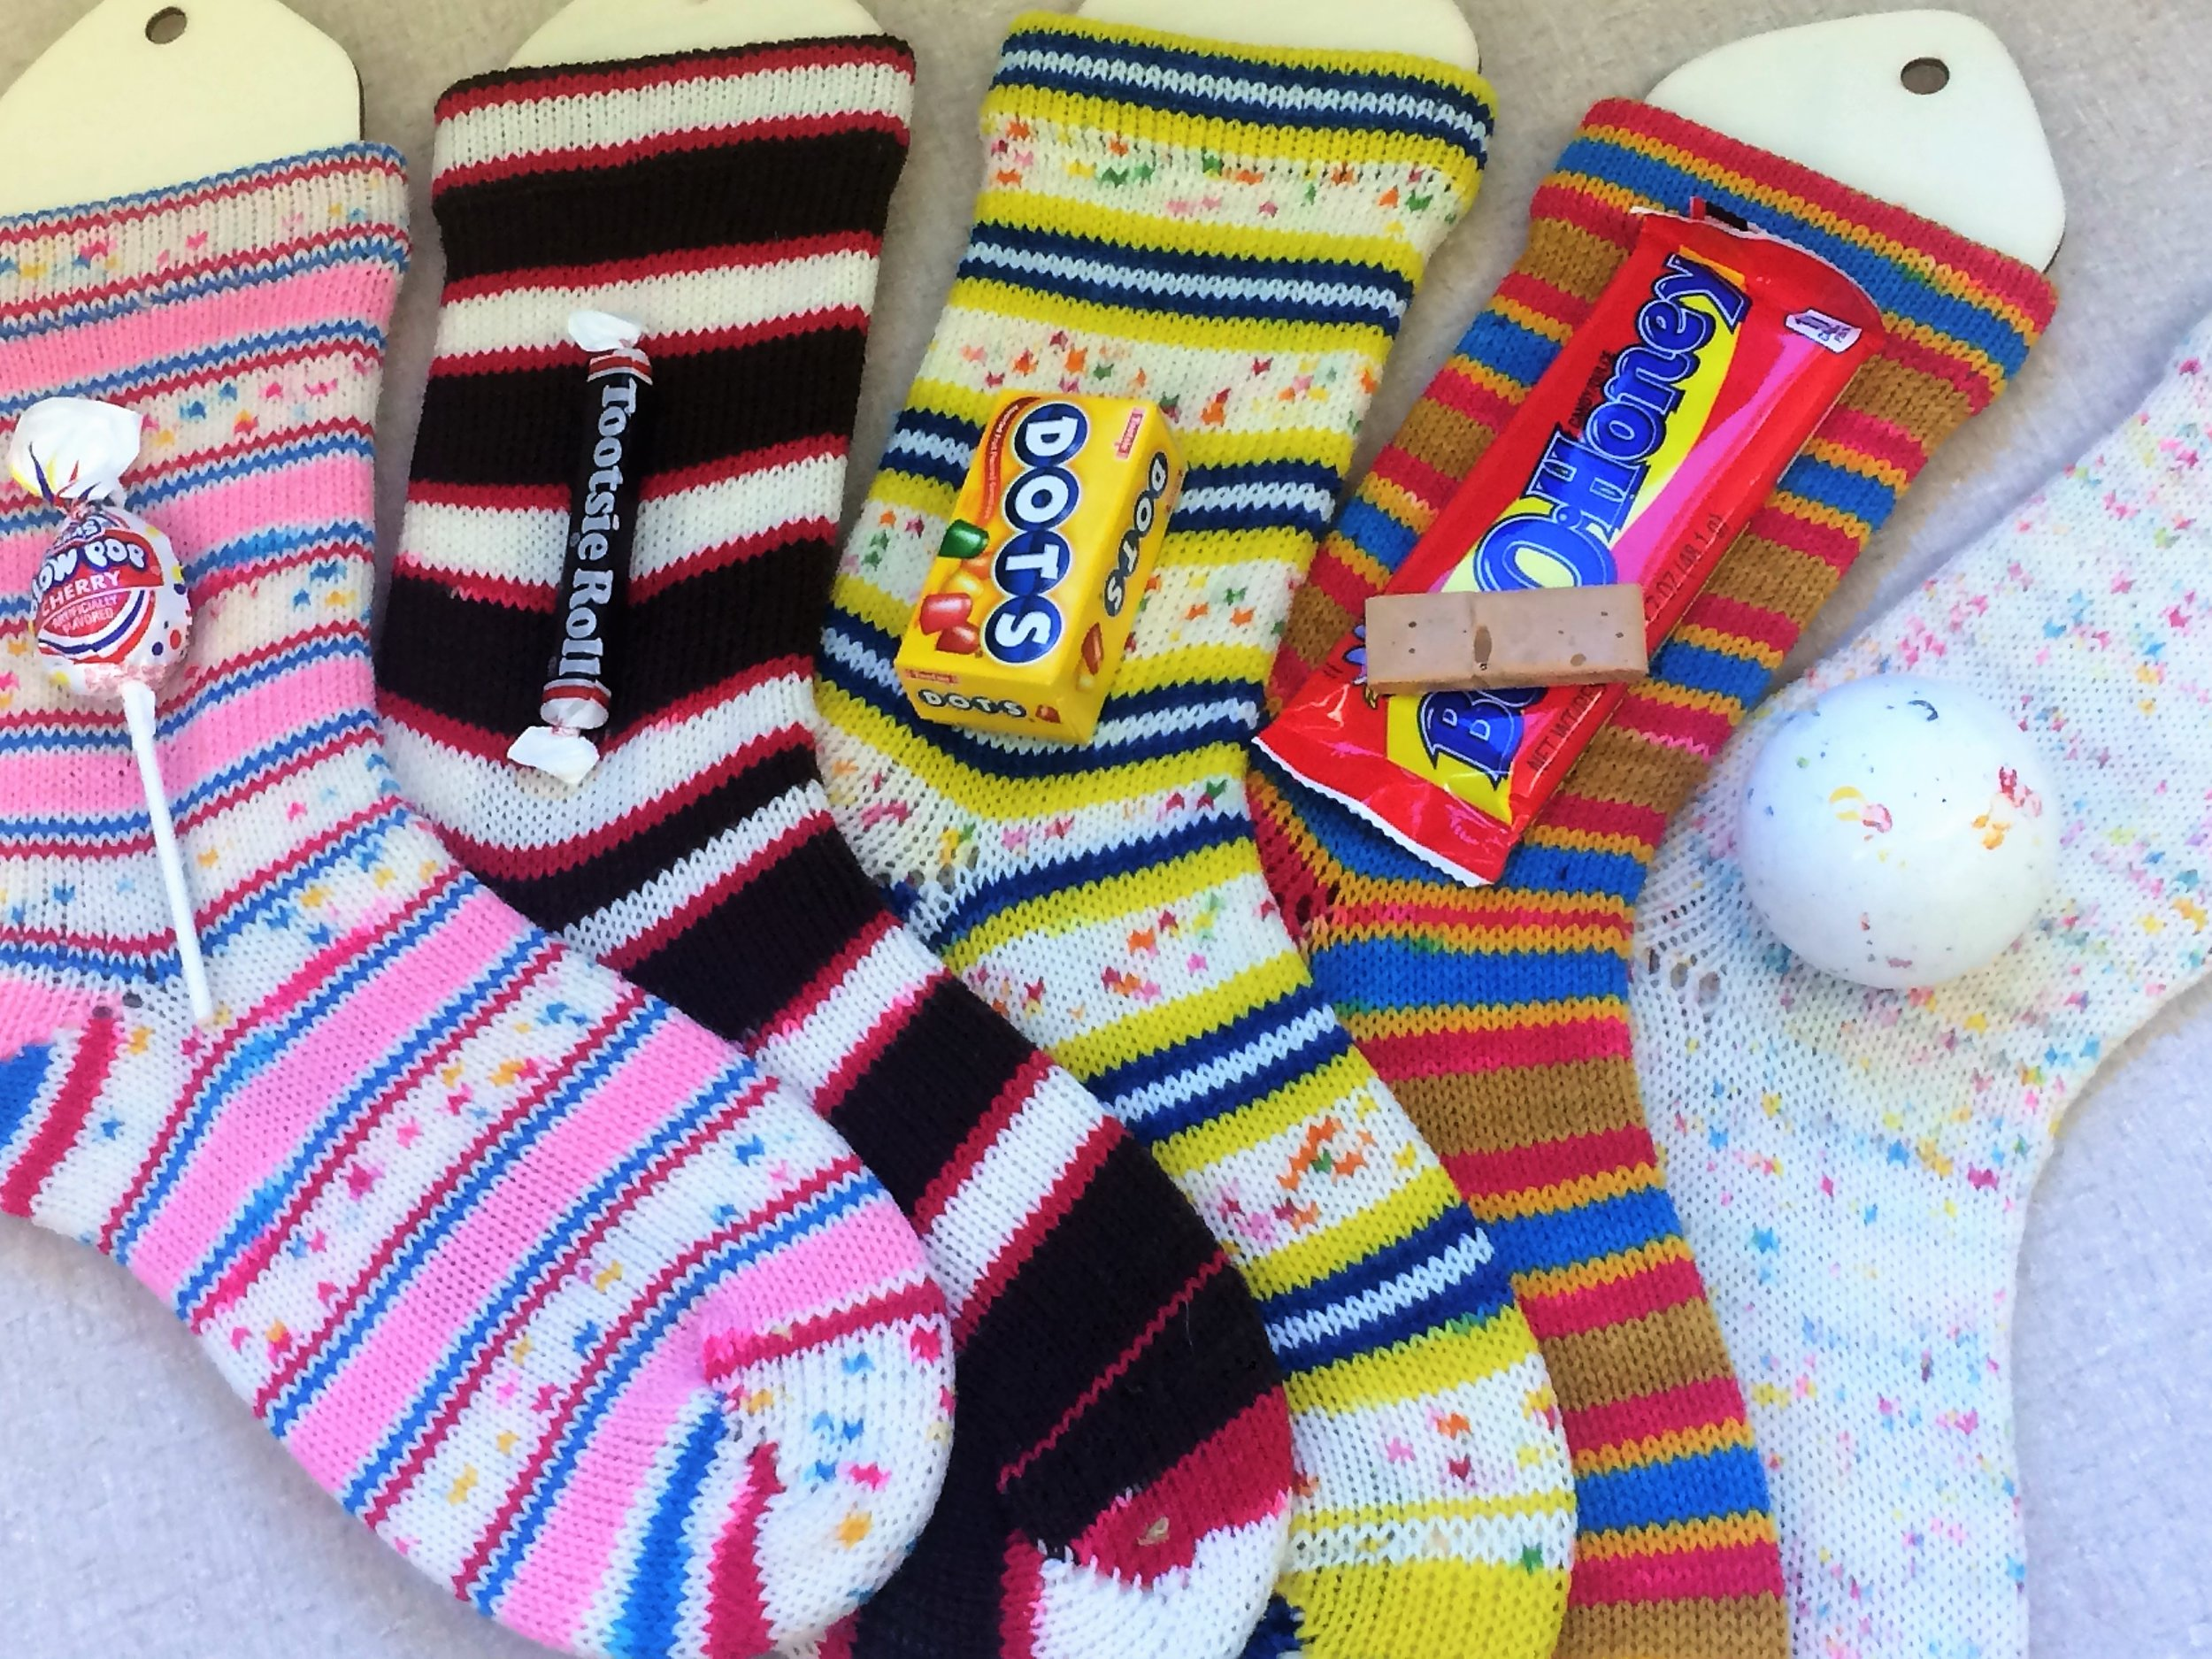 Basic sock knitting pattern and self striping yarn it self stripes as you knit simply knit along and a fun pattern will emerge bankloansurffo Gallery